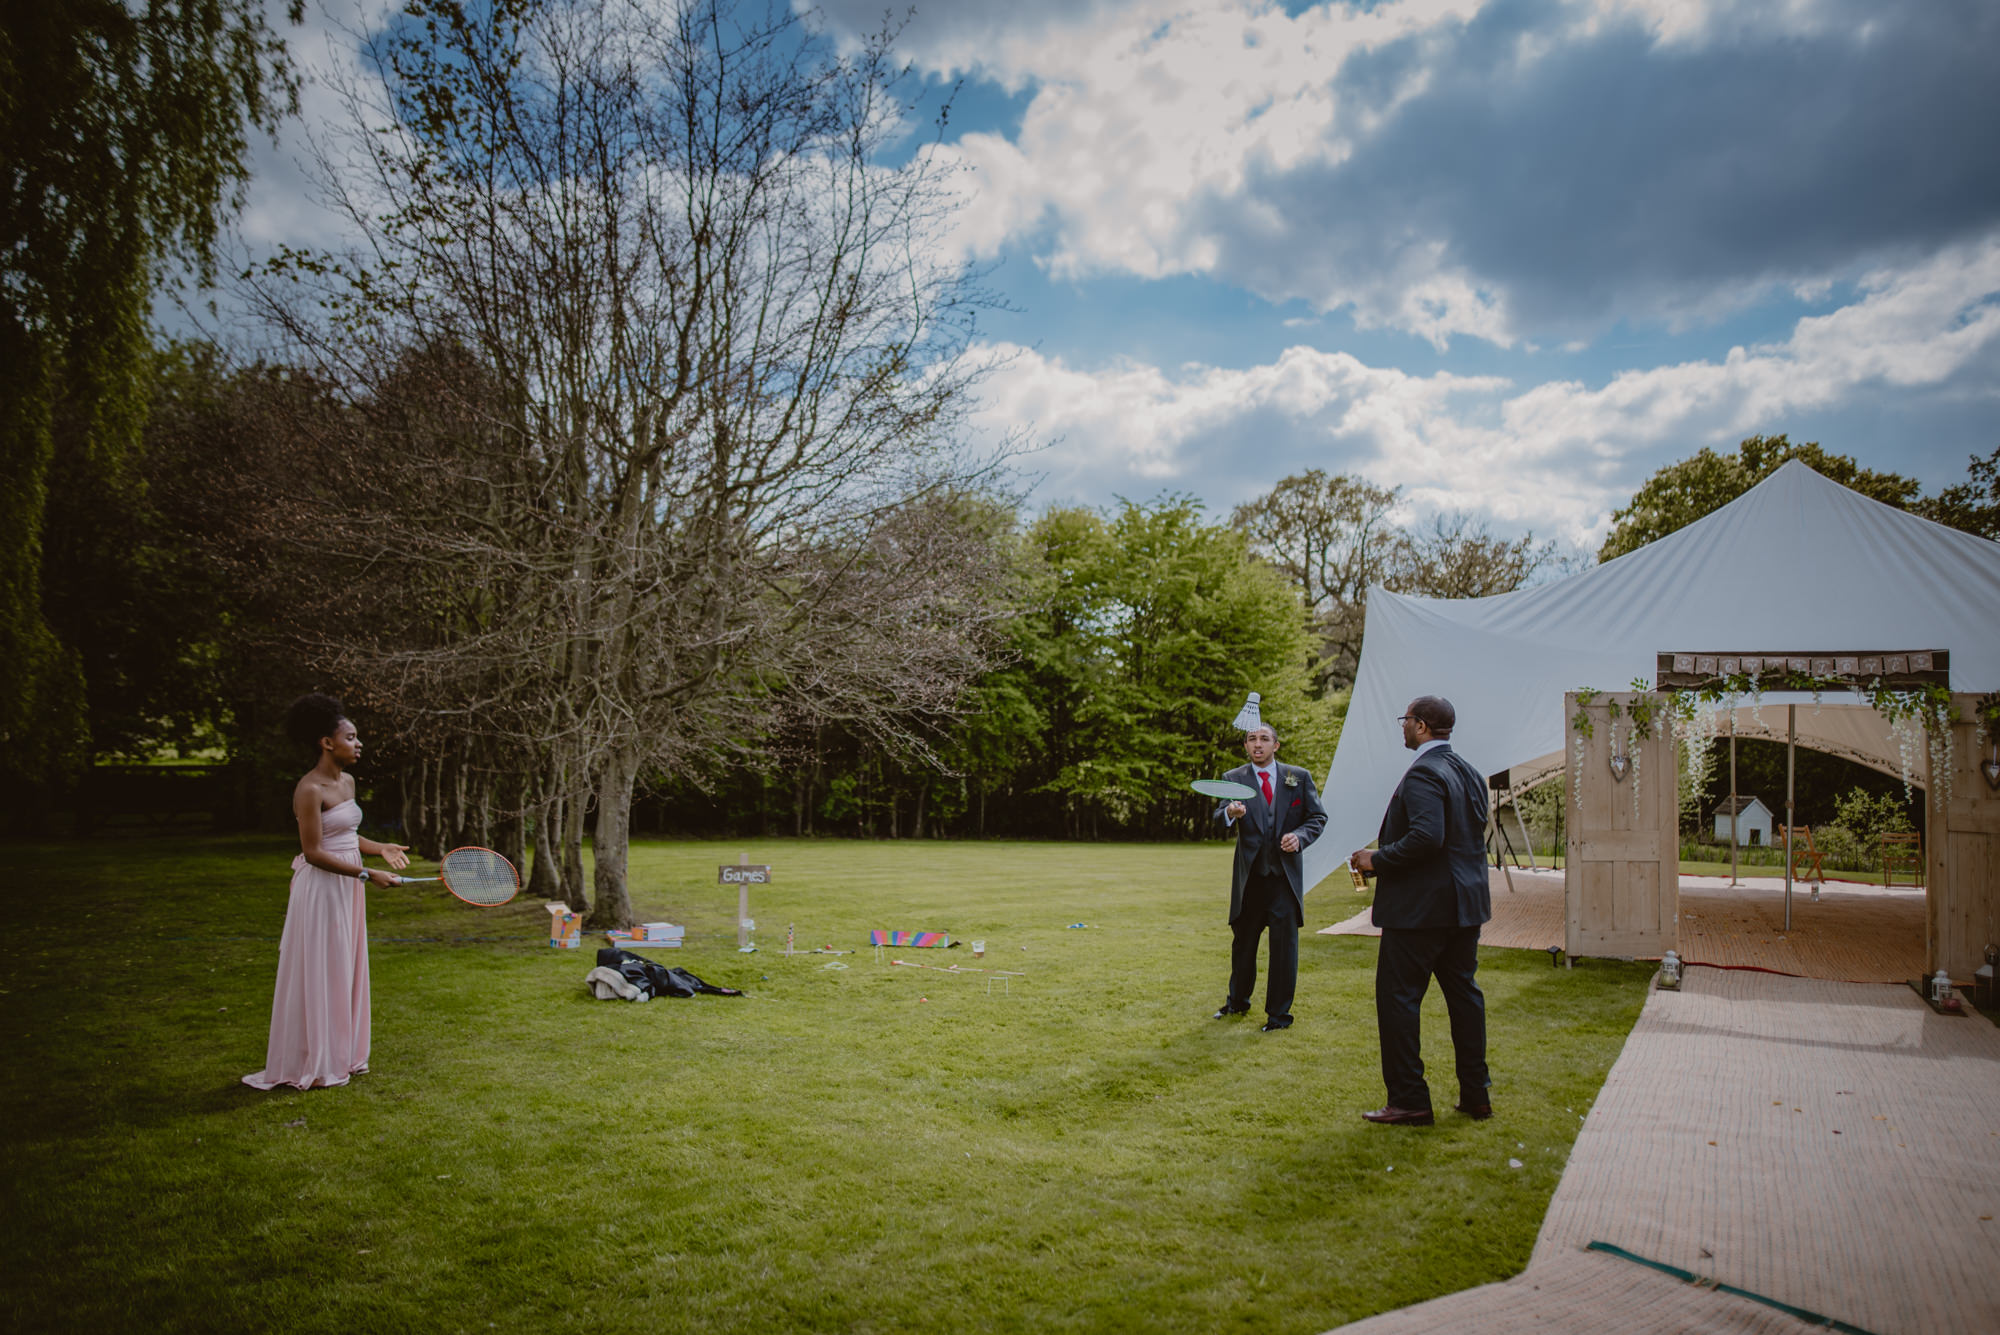 Jacqueline-Gareth-Wedding-Westmead-Events-Surrey-Manu-Mendoza-Wedding-Photography-334.jpg